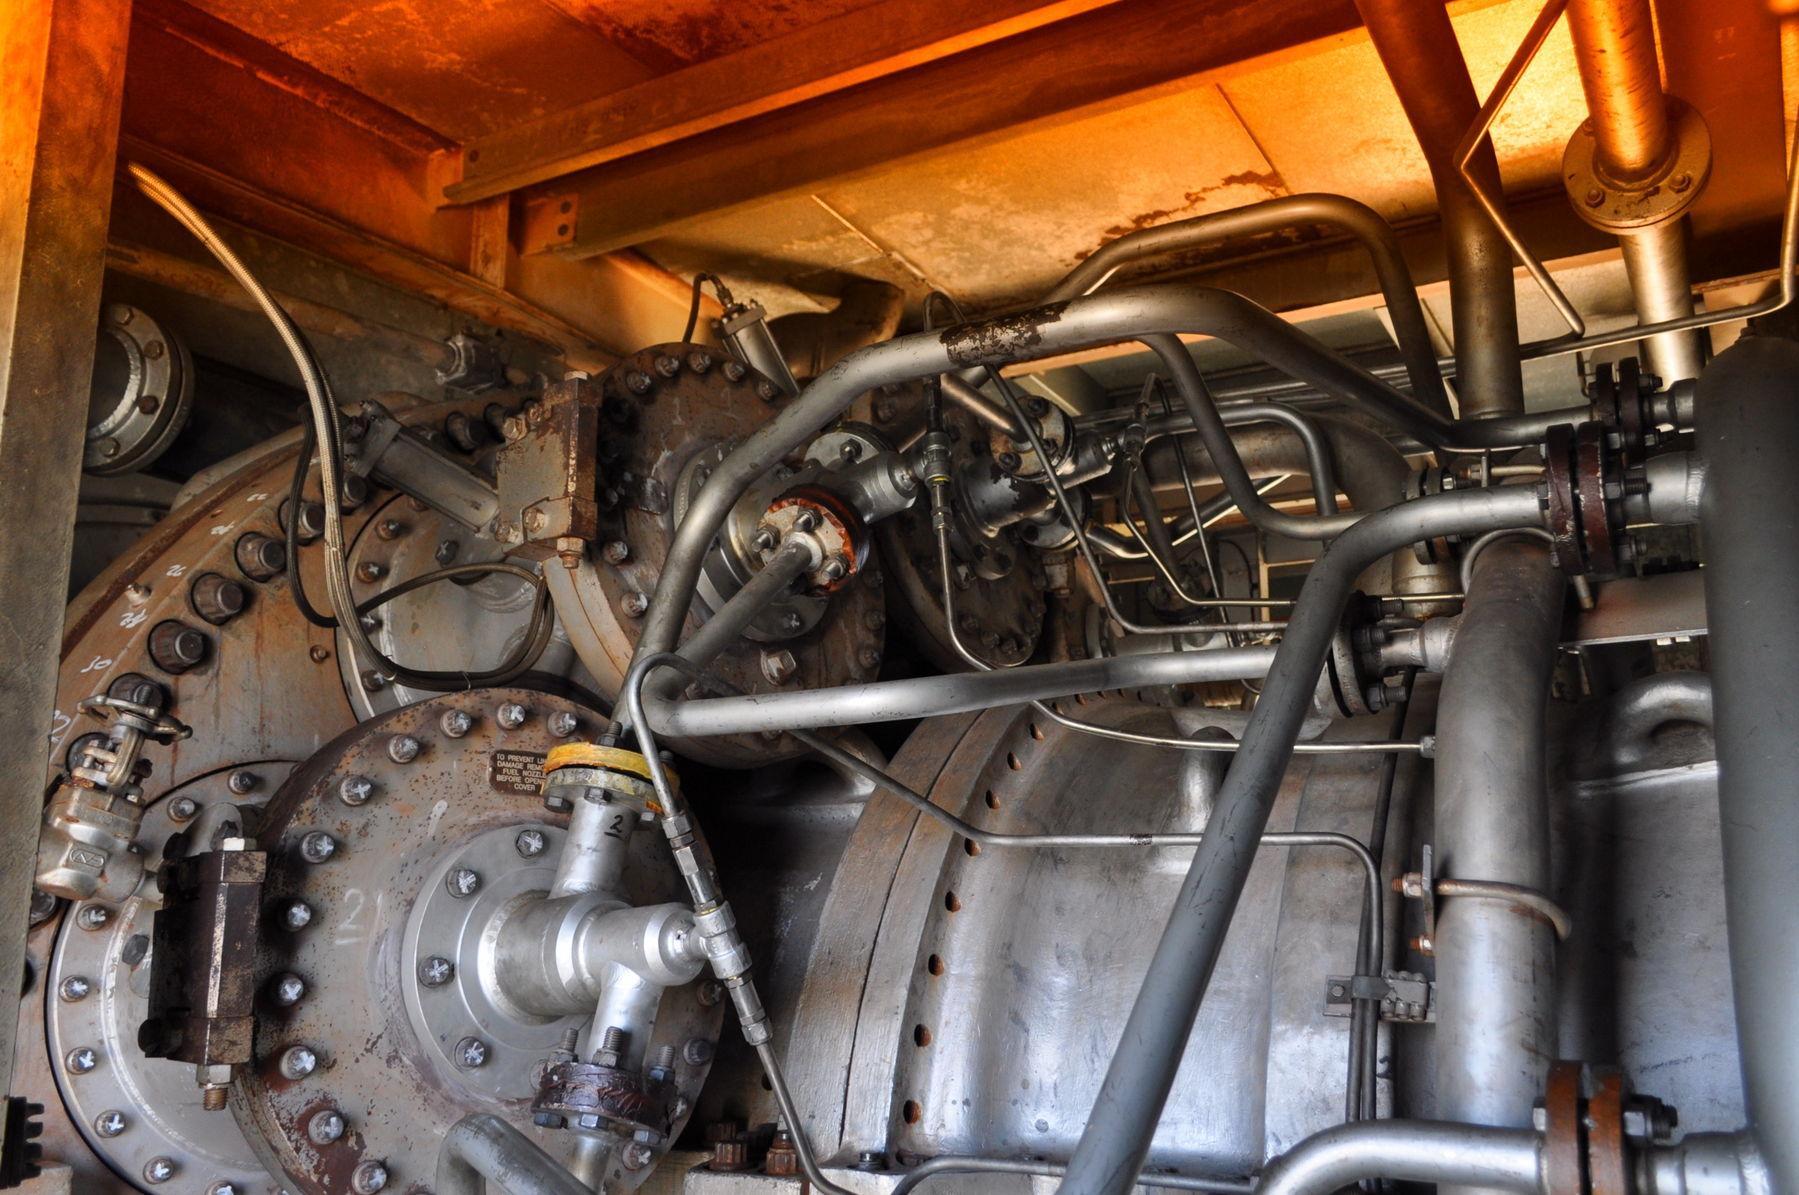 GE Frame 6 gas turbine bustion chambers